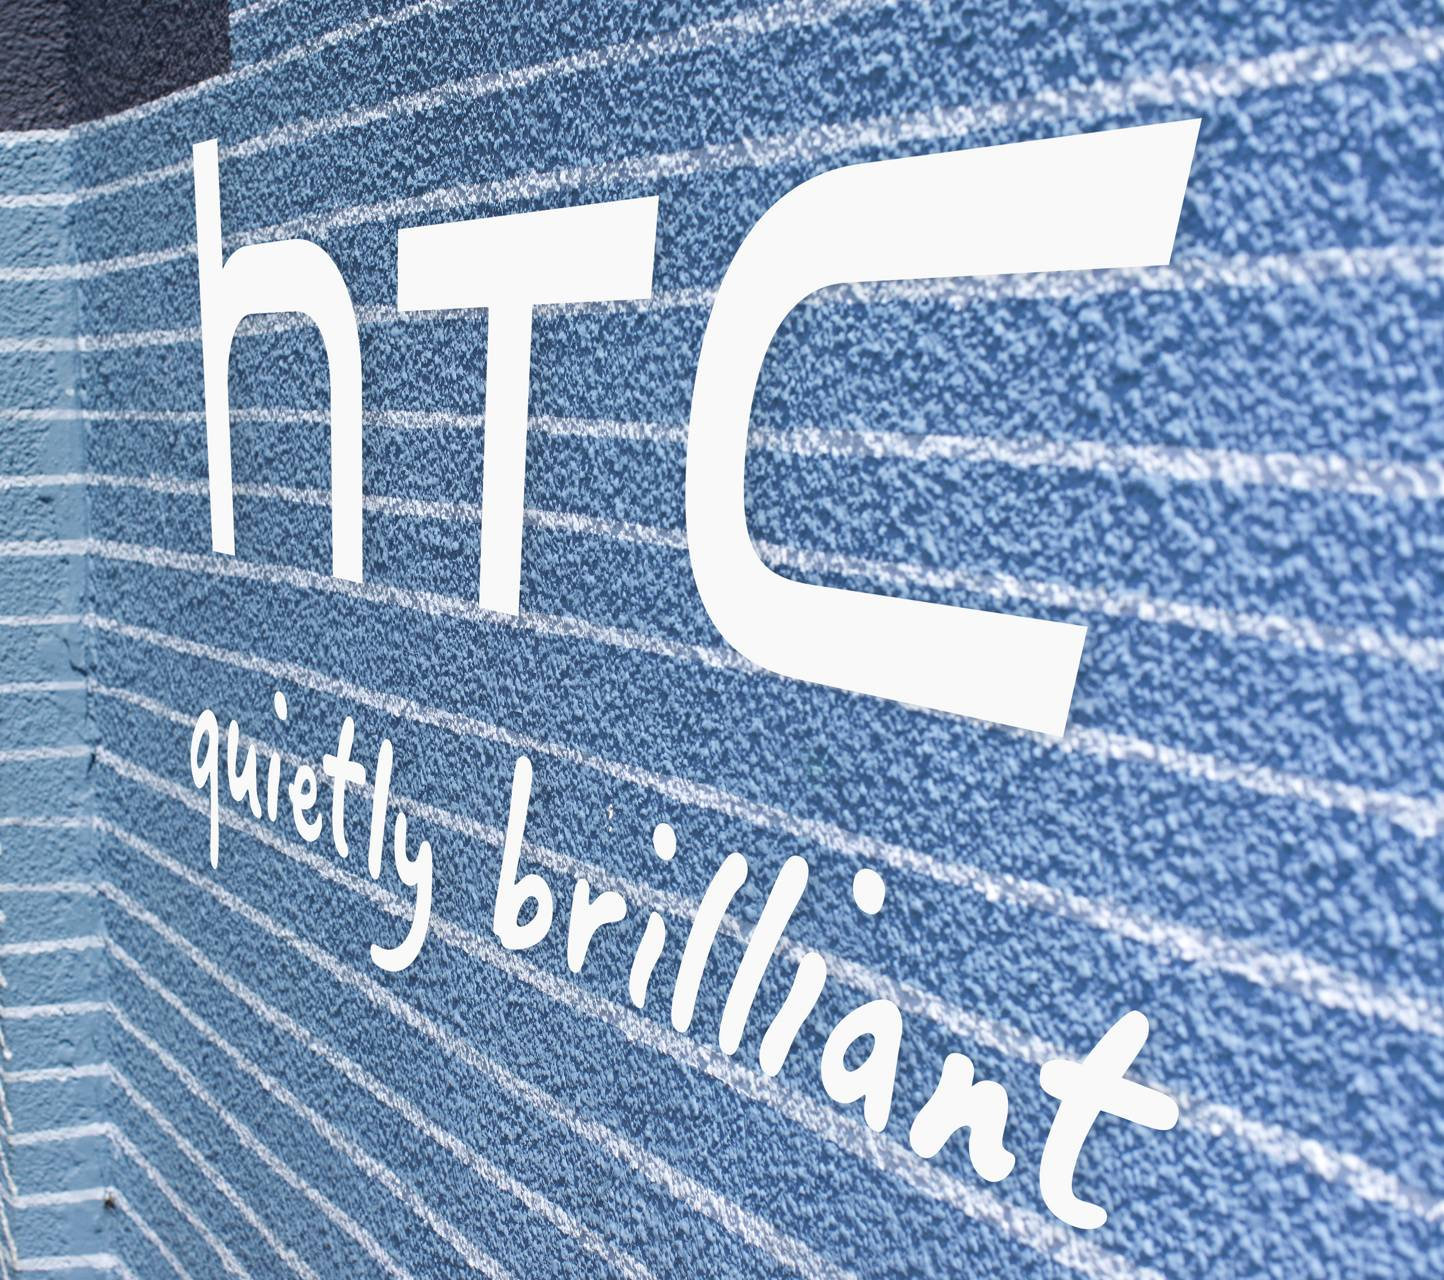 Htc wall